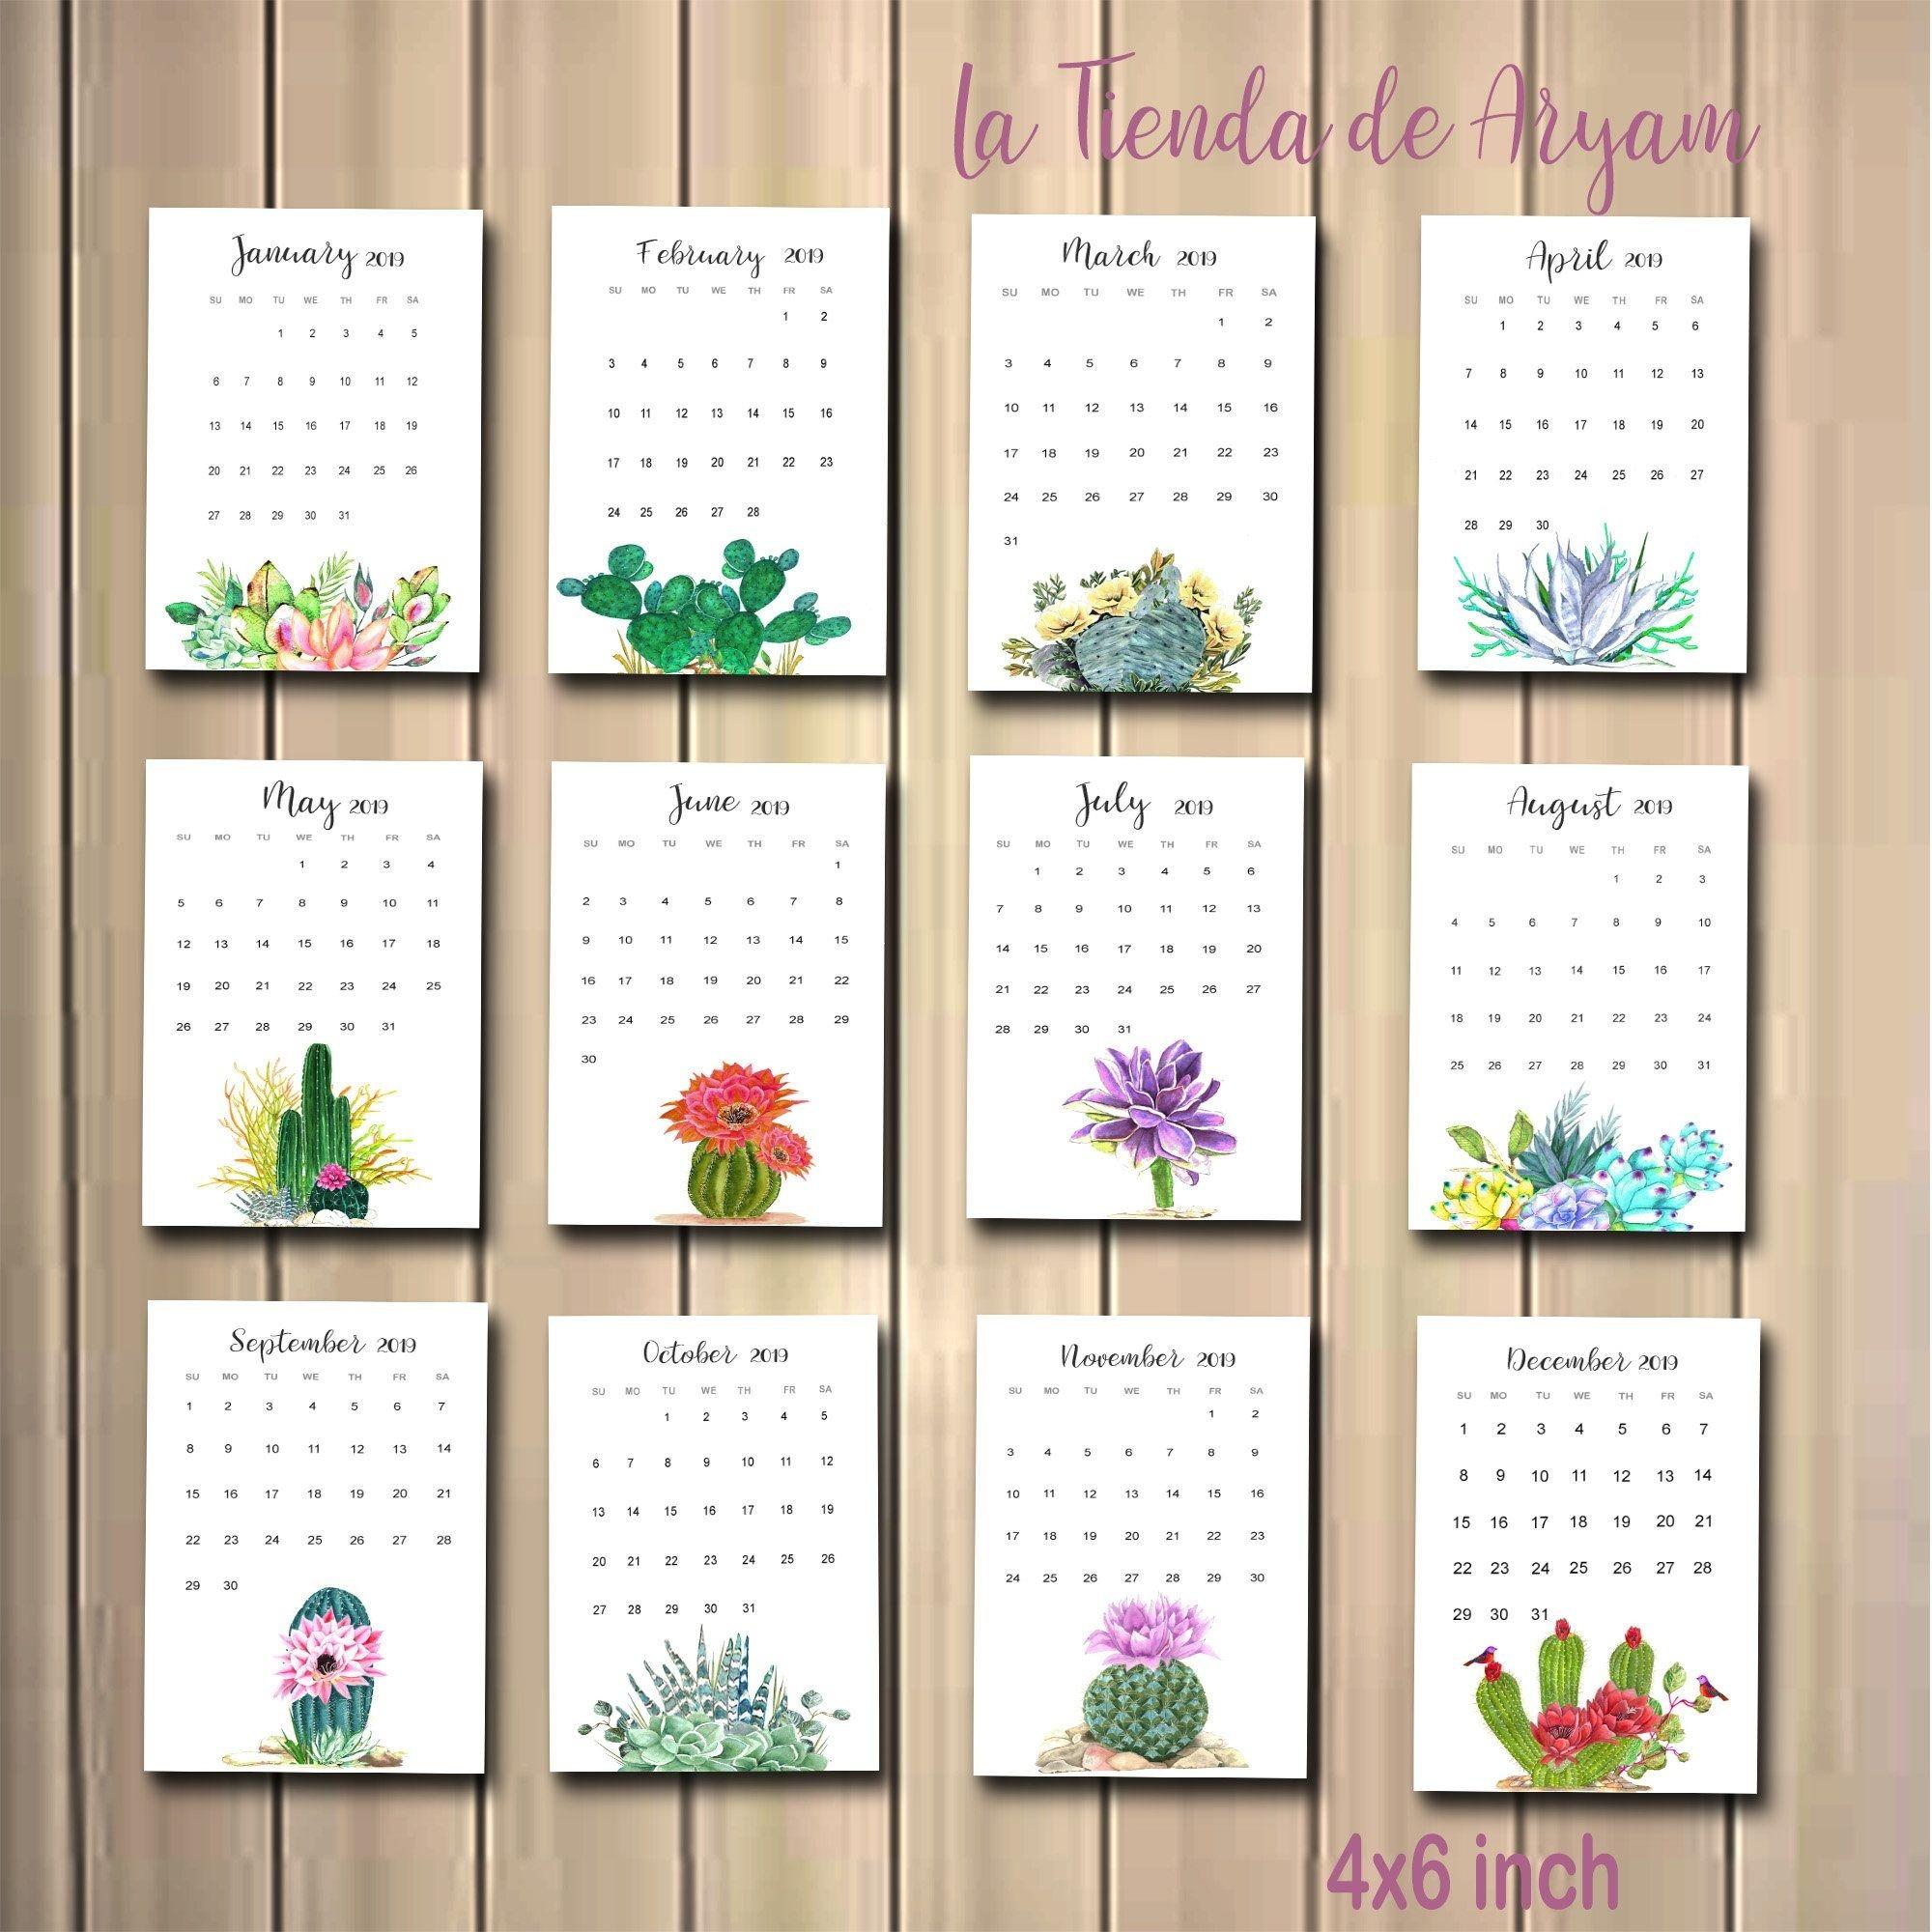 Printable 2021 Calendar Cactus Cactus In Pots Desk Calendar-4X6 Free Printables 2021 Calendars